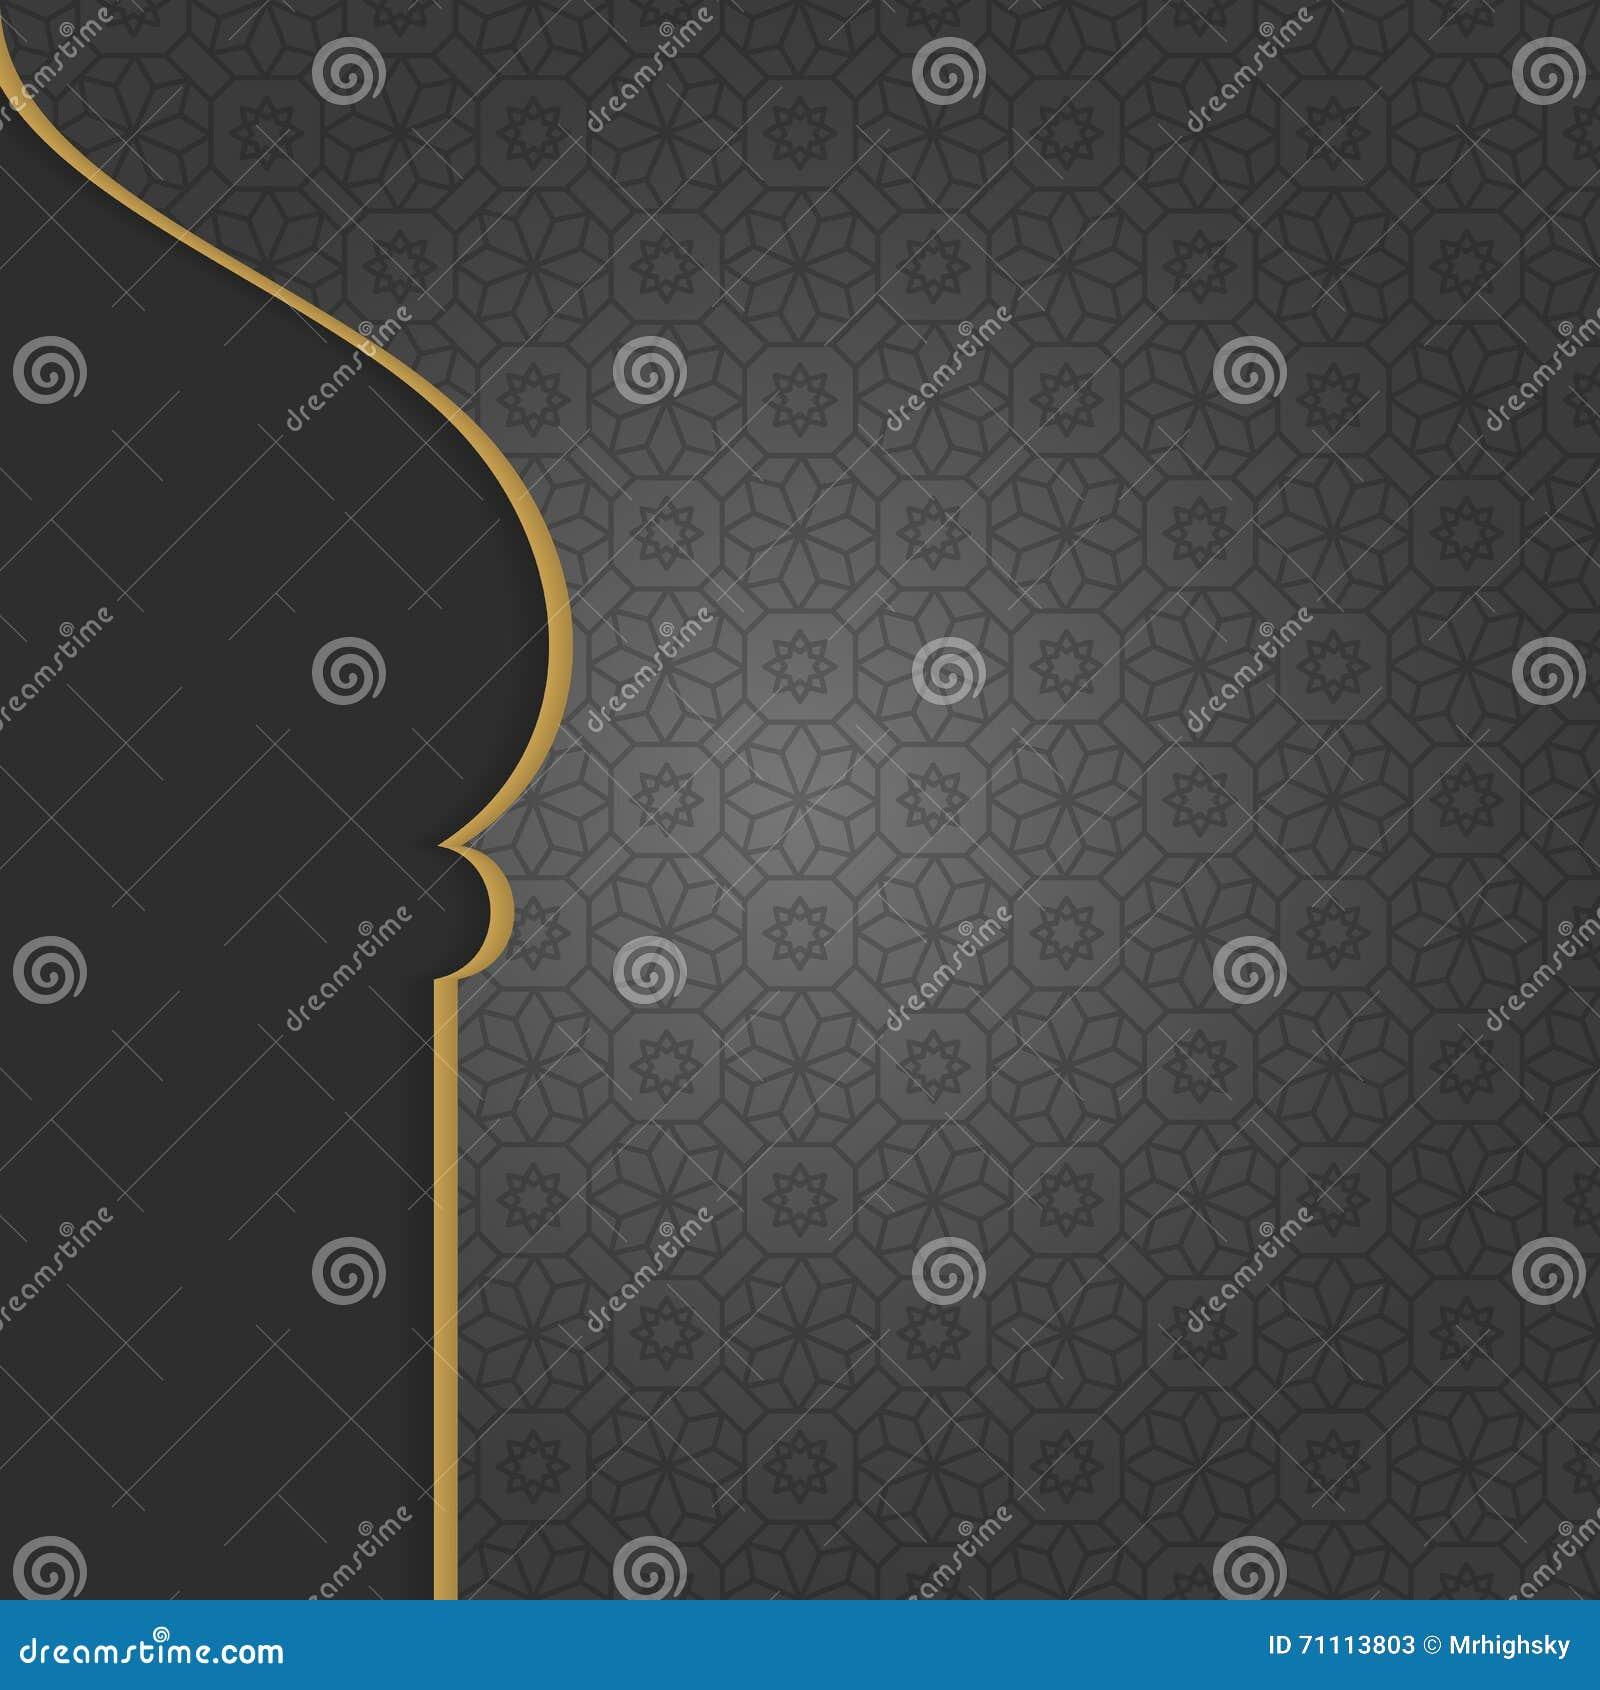 background vector arabian religious - photo #29